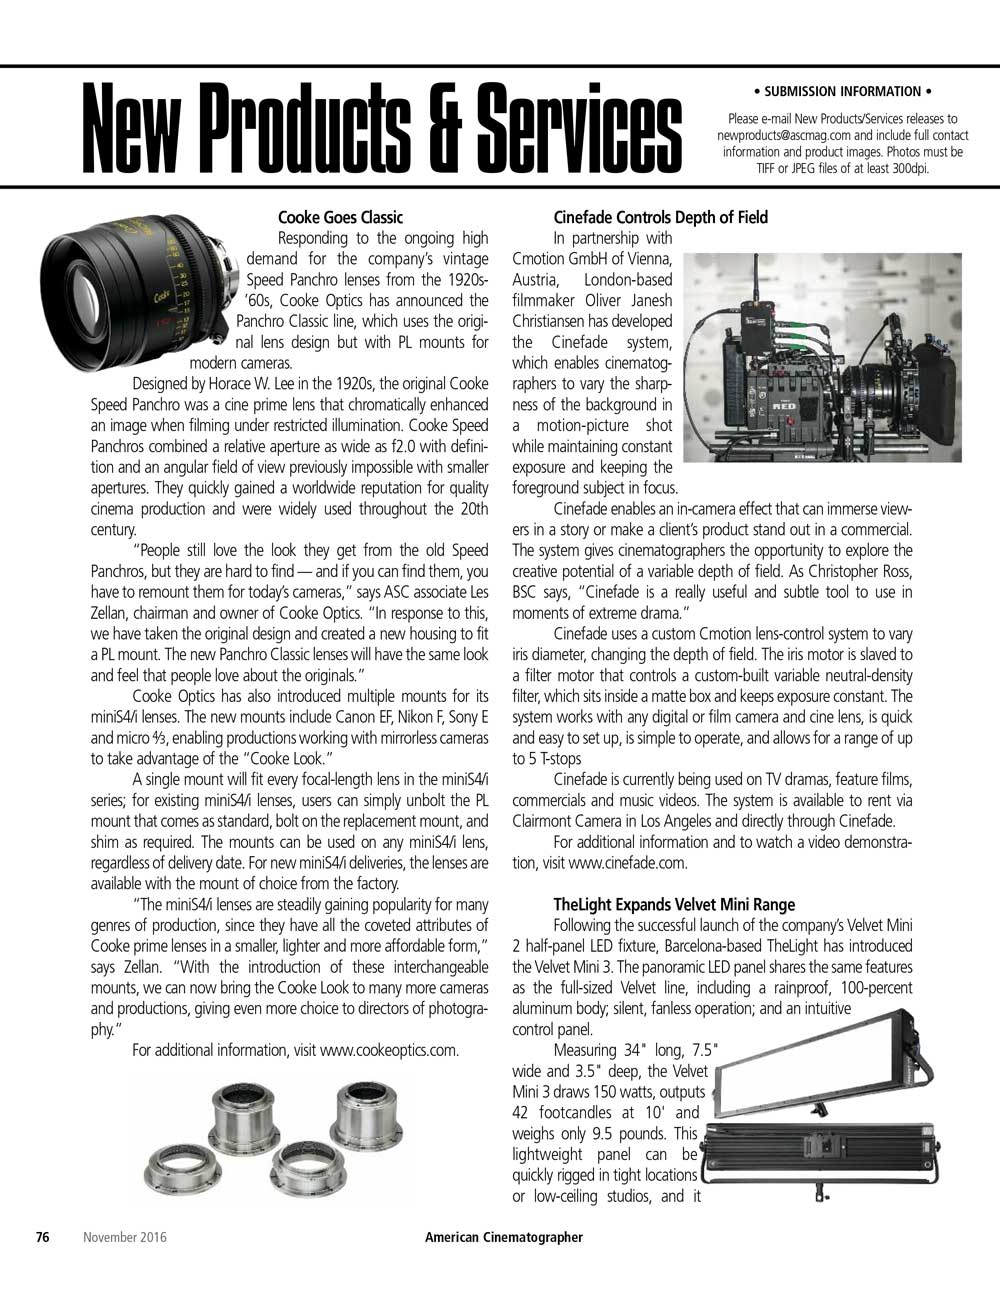 Cinefade---Press---ASC-article---web.jpg